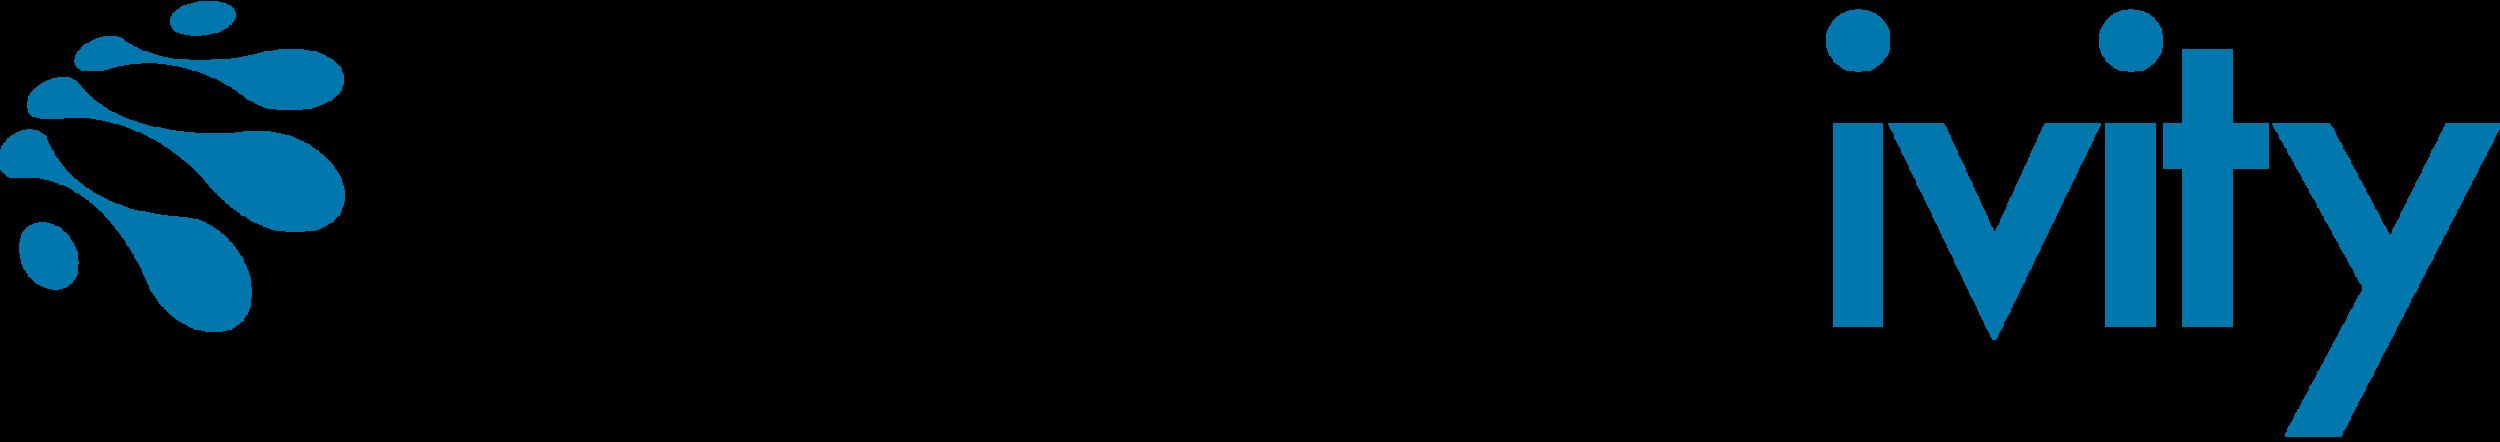 iConnectivity Corporate Logos